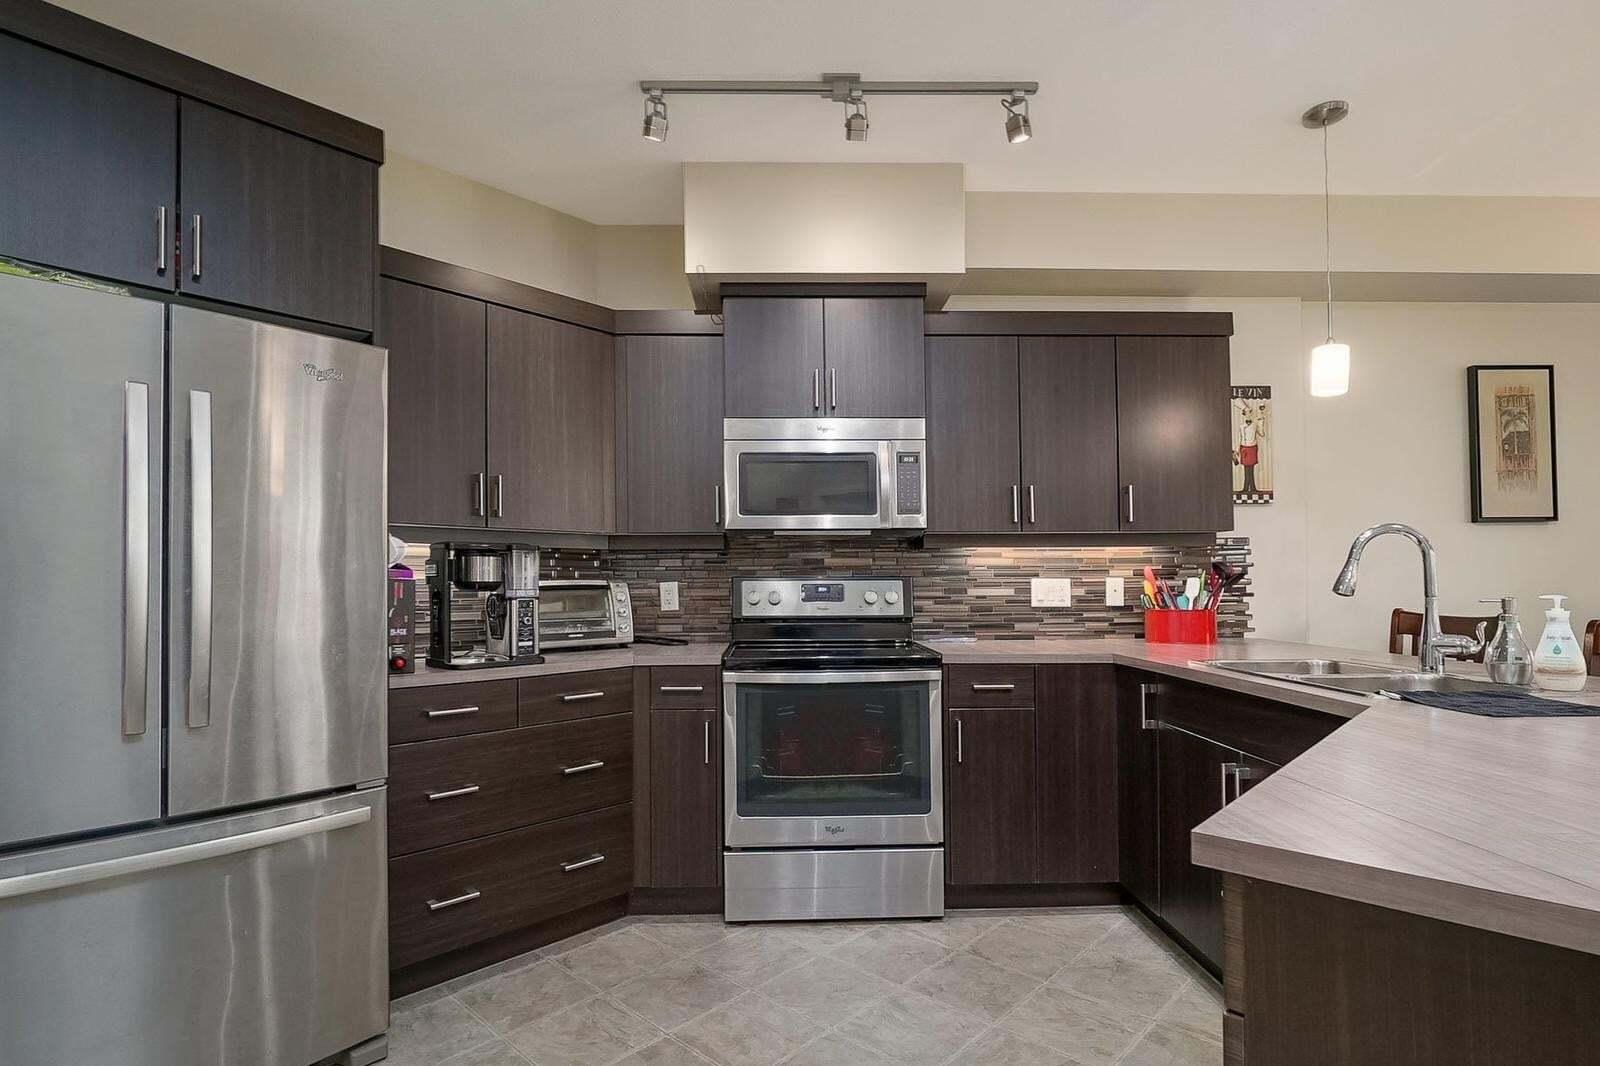 Condo for sale at 3733 Casorso Rd Kelowna British Columbia - MLS: 10215580